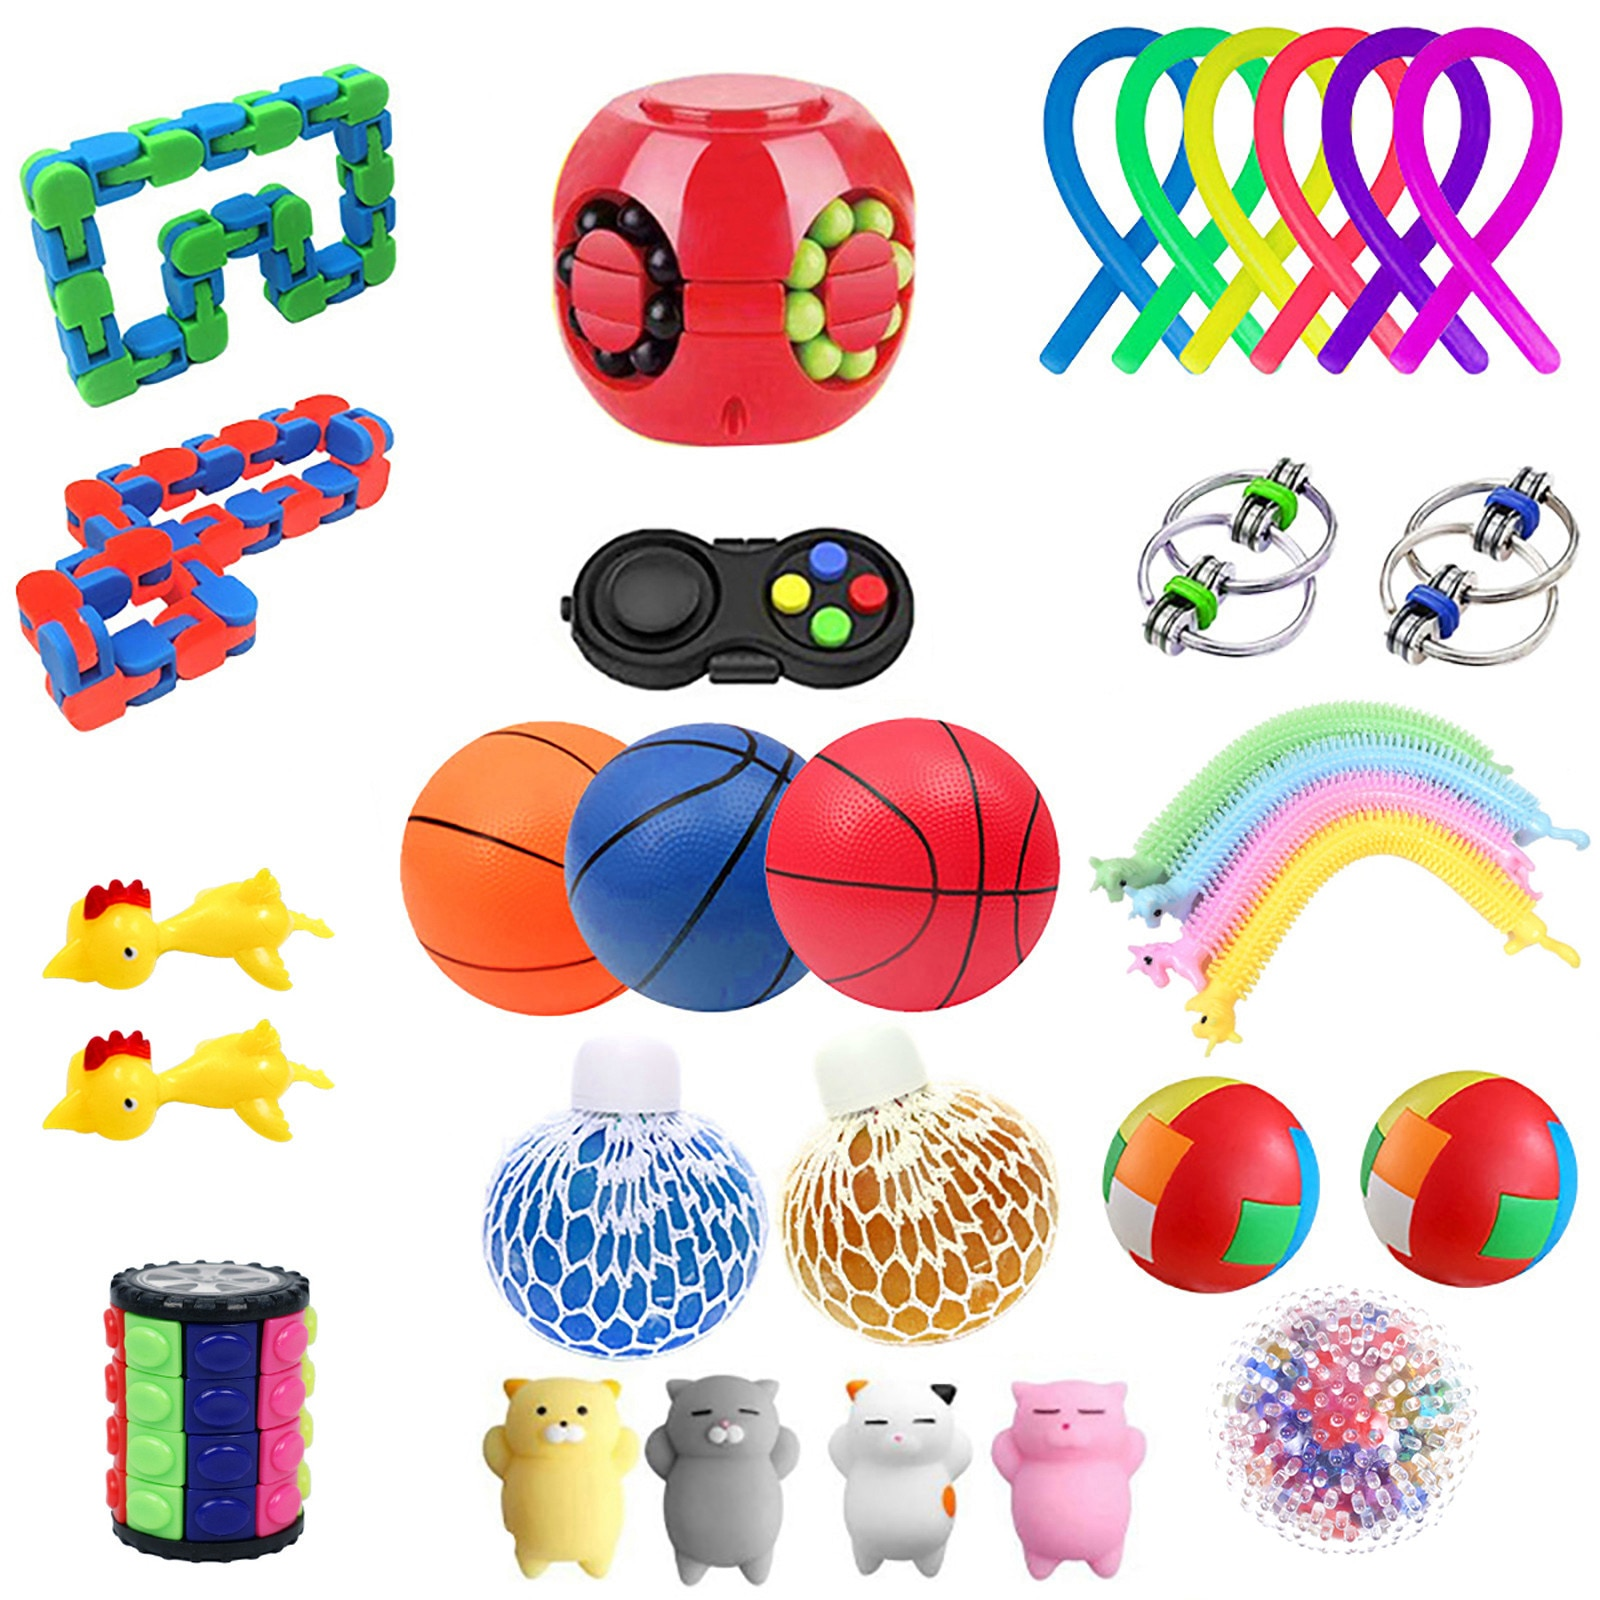 Fidget Toys Box Antiestres Stress Ball Fidges Popit Toy Set Wacky Track Cheap Sensory Pack For Kids Juguete Sensorial Antiest enlarge